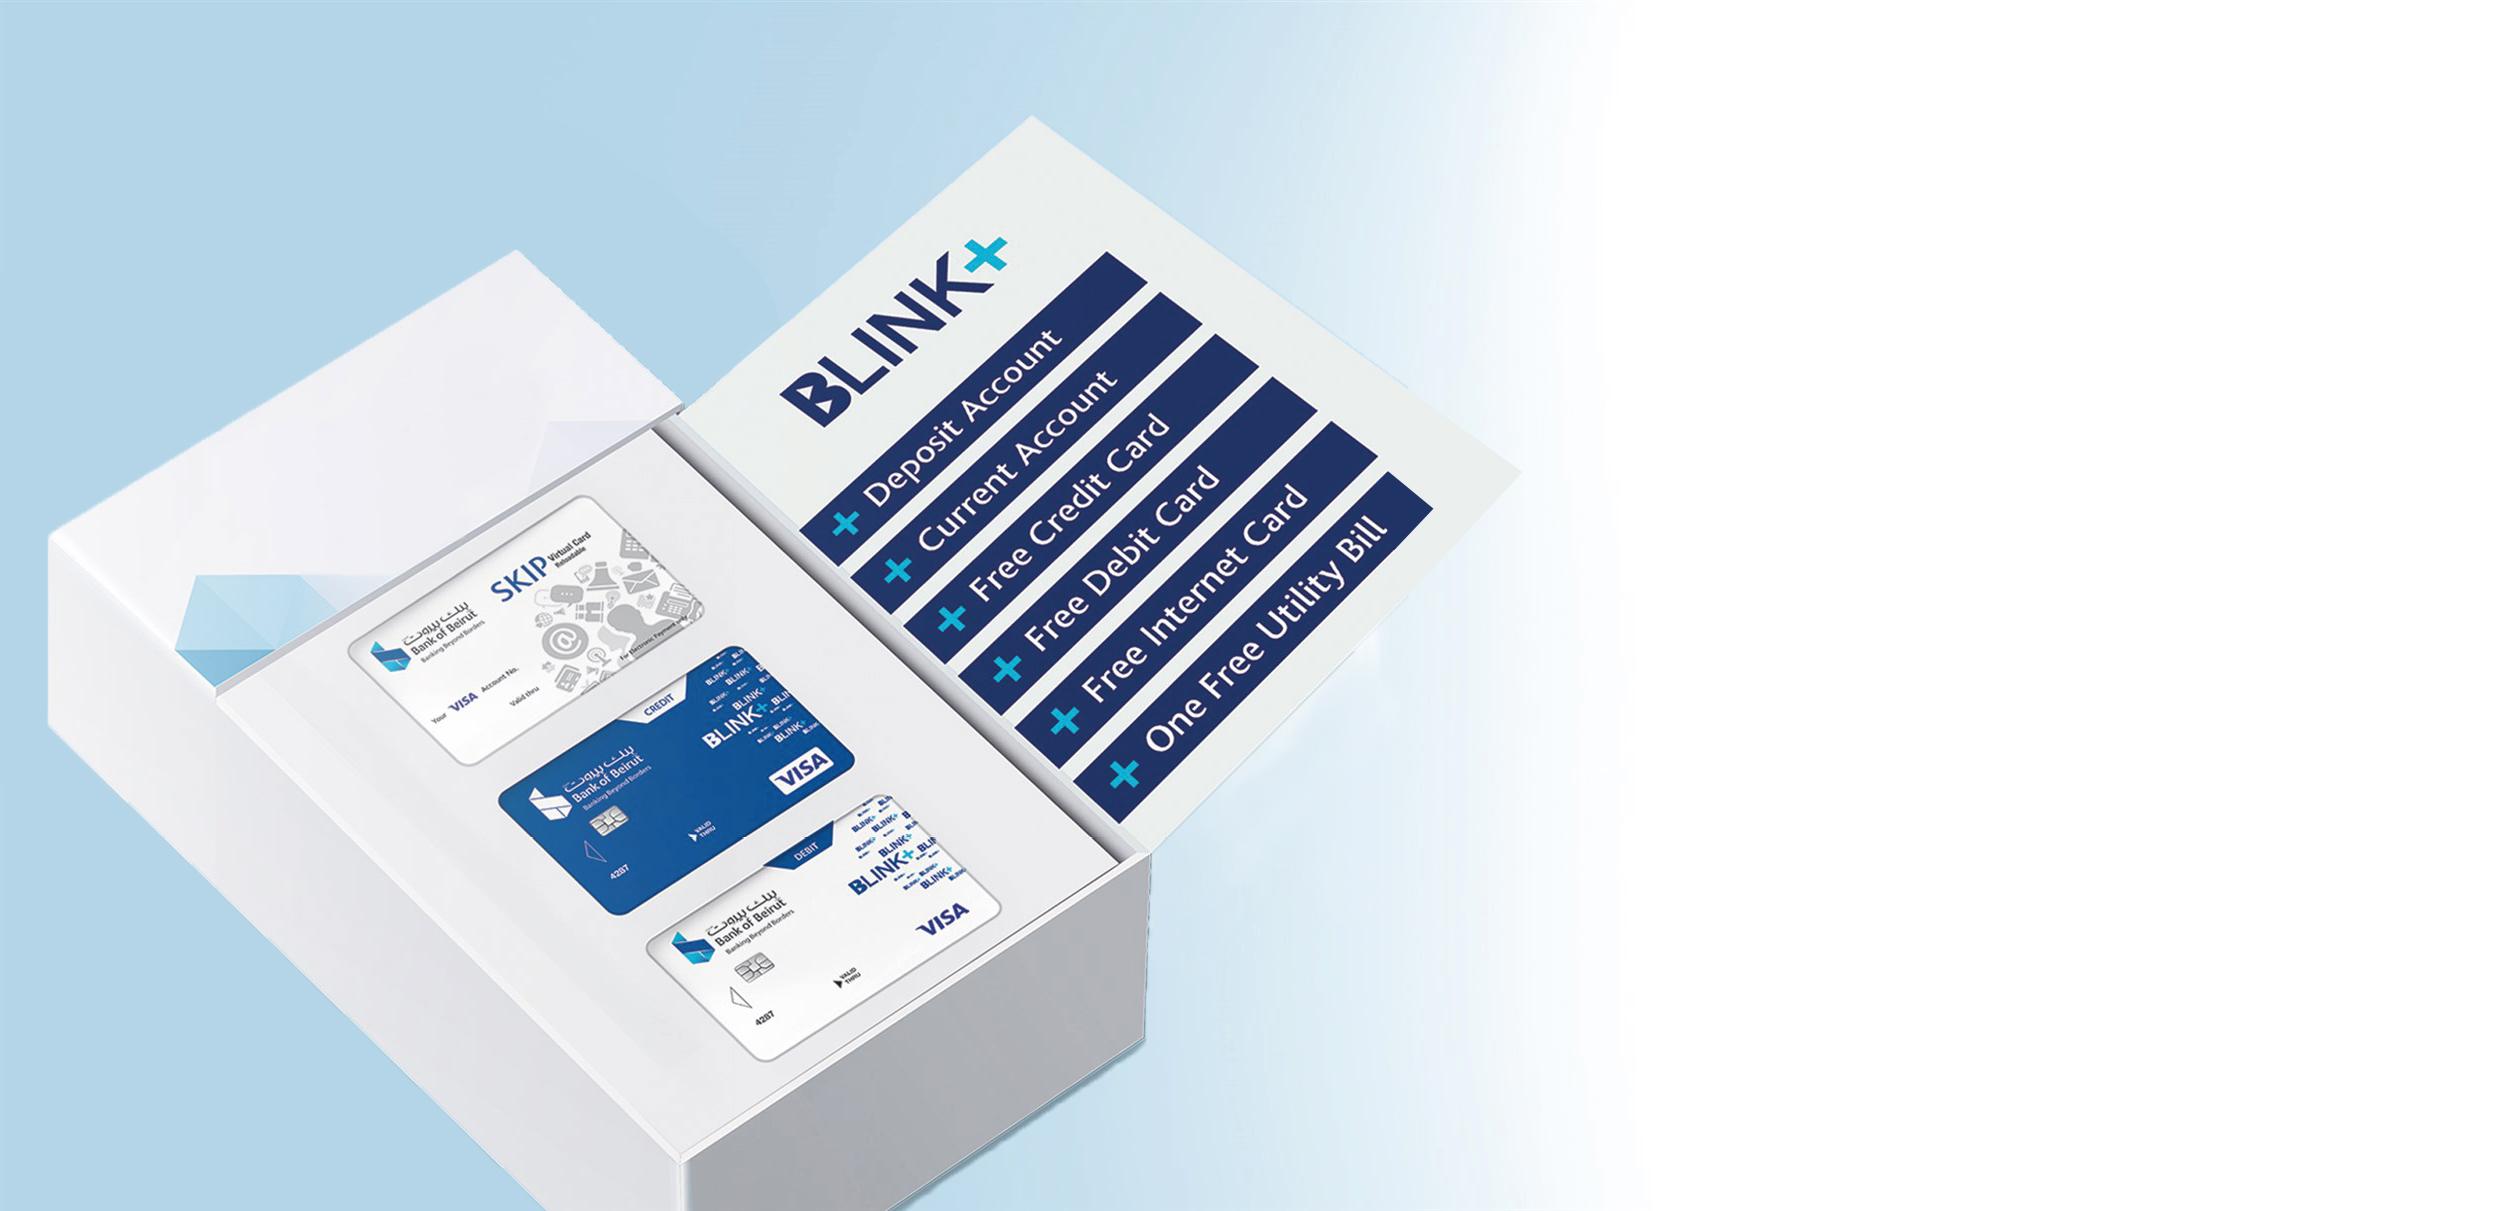 Blink Plus